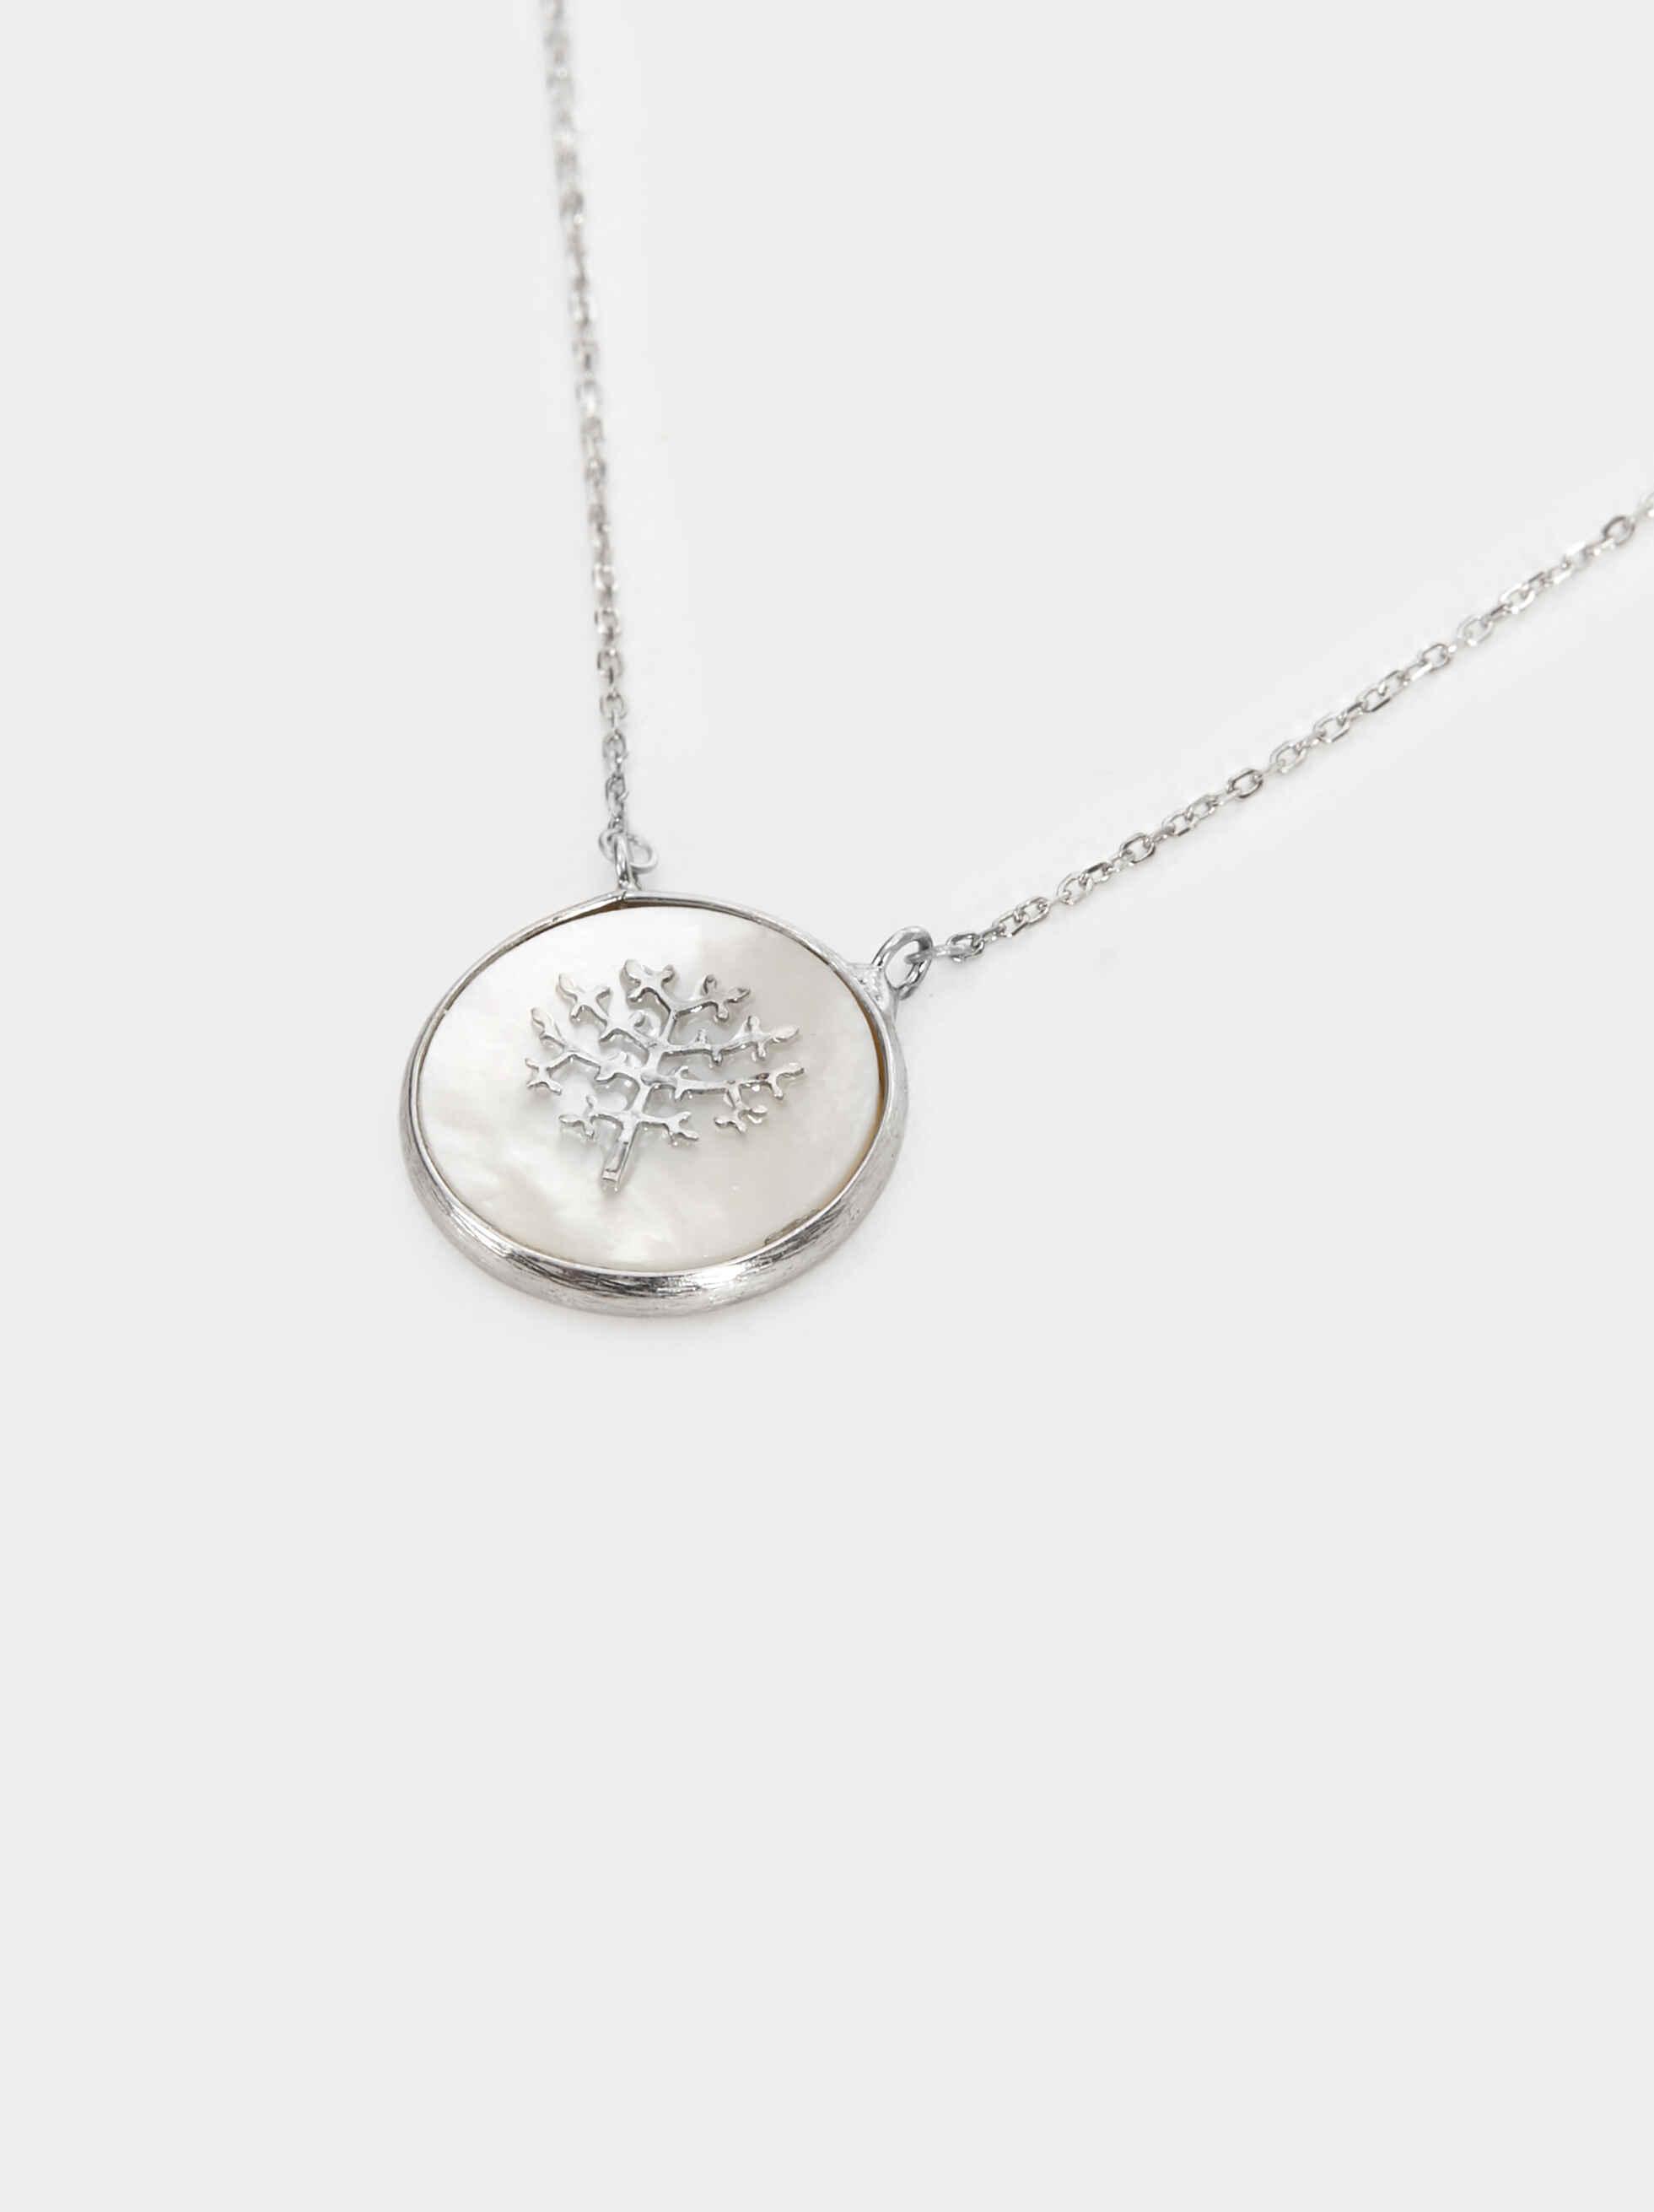 Short 925 Silver Tree Necklace, Beige, hi-res